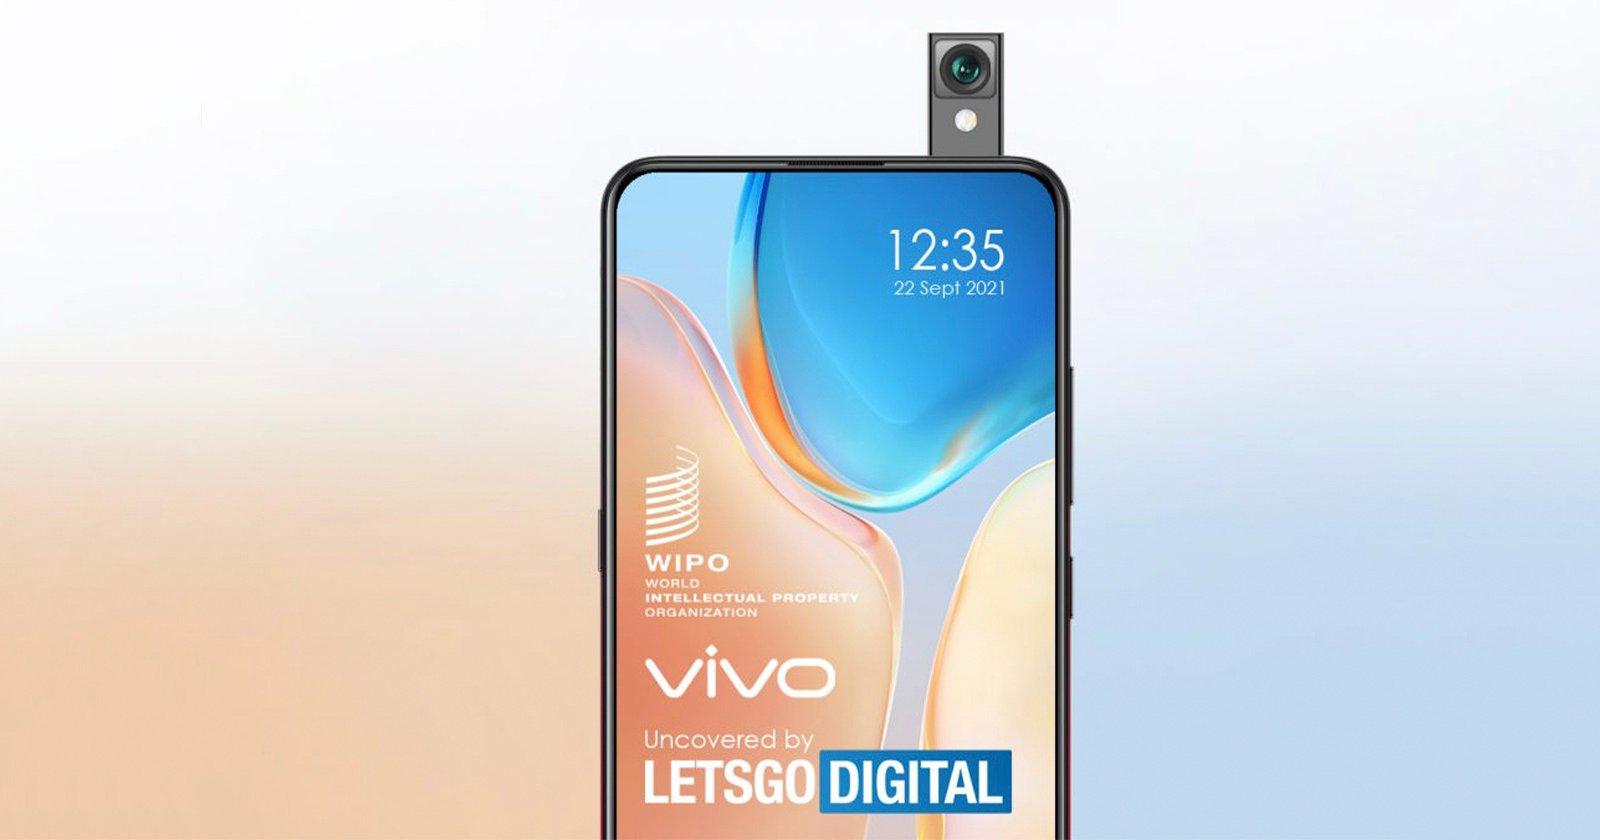 Vivo Designs Detachable, Double-Sided Pop-Up Smartphone Camera